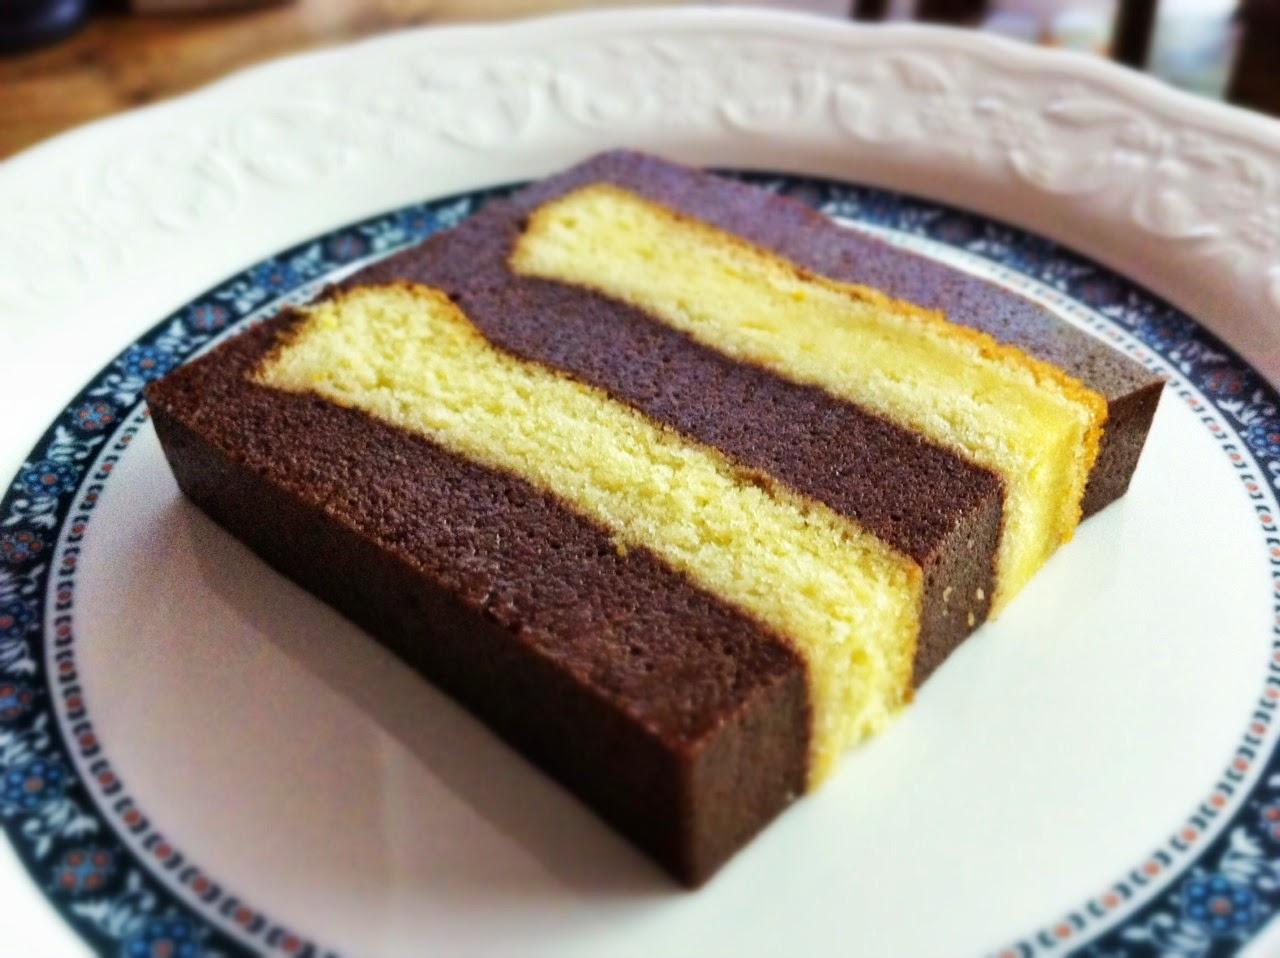 Chocolate layer pudding cake